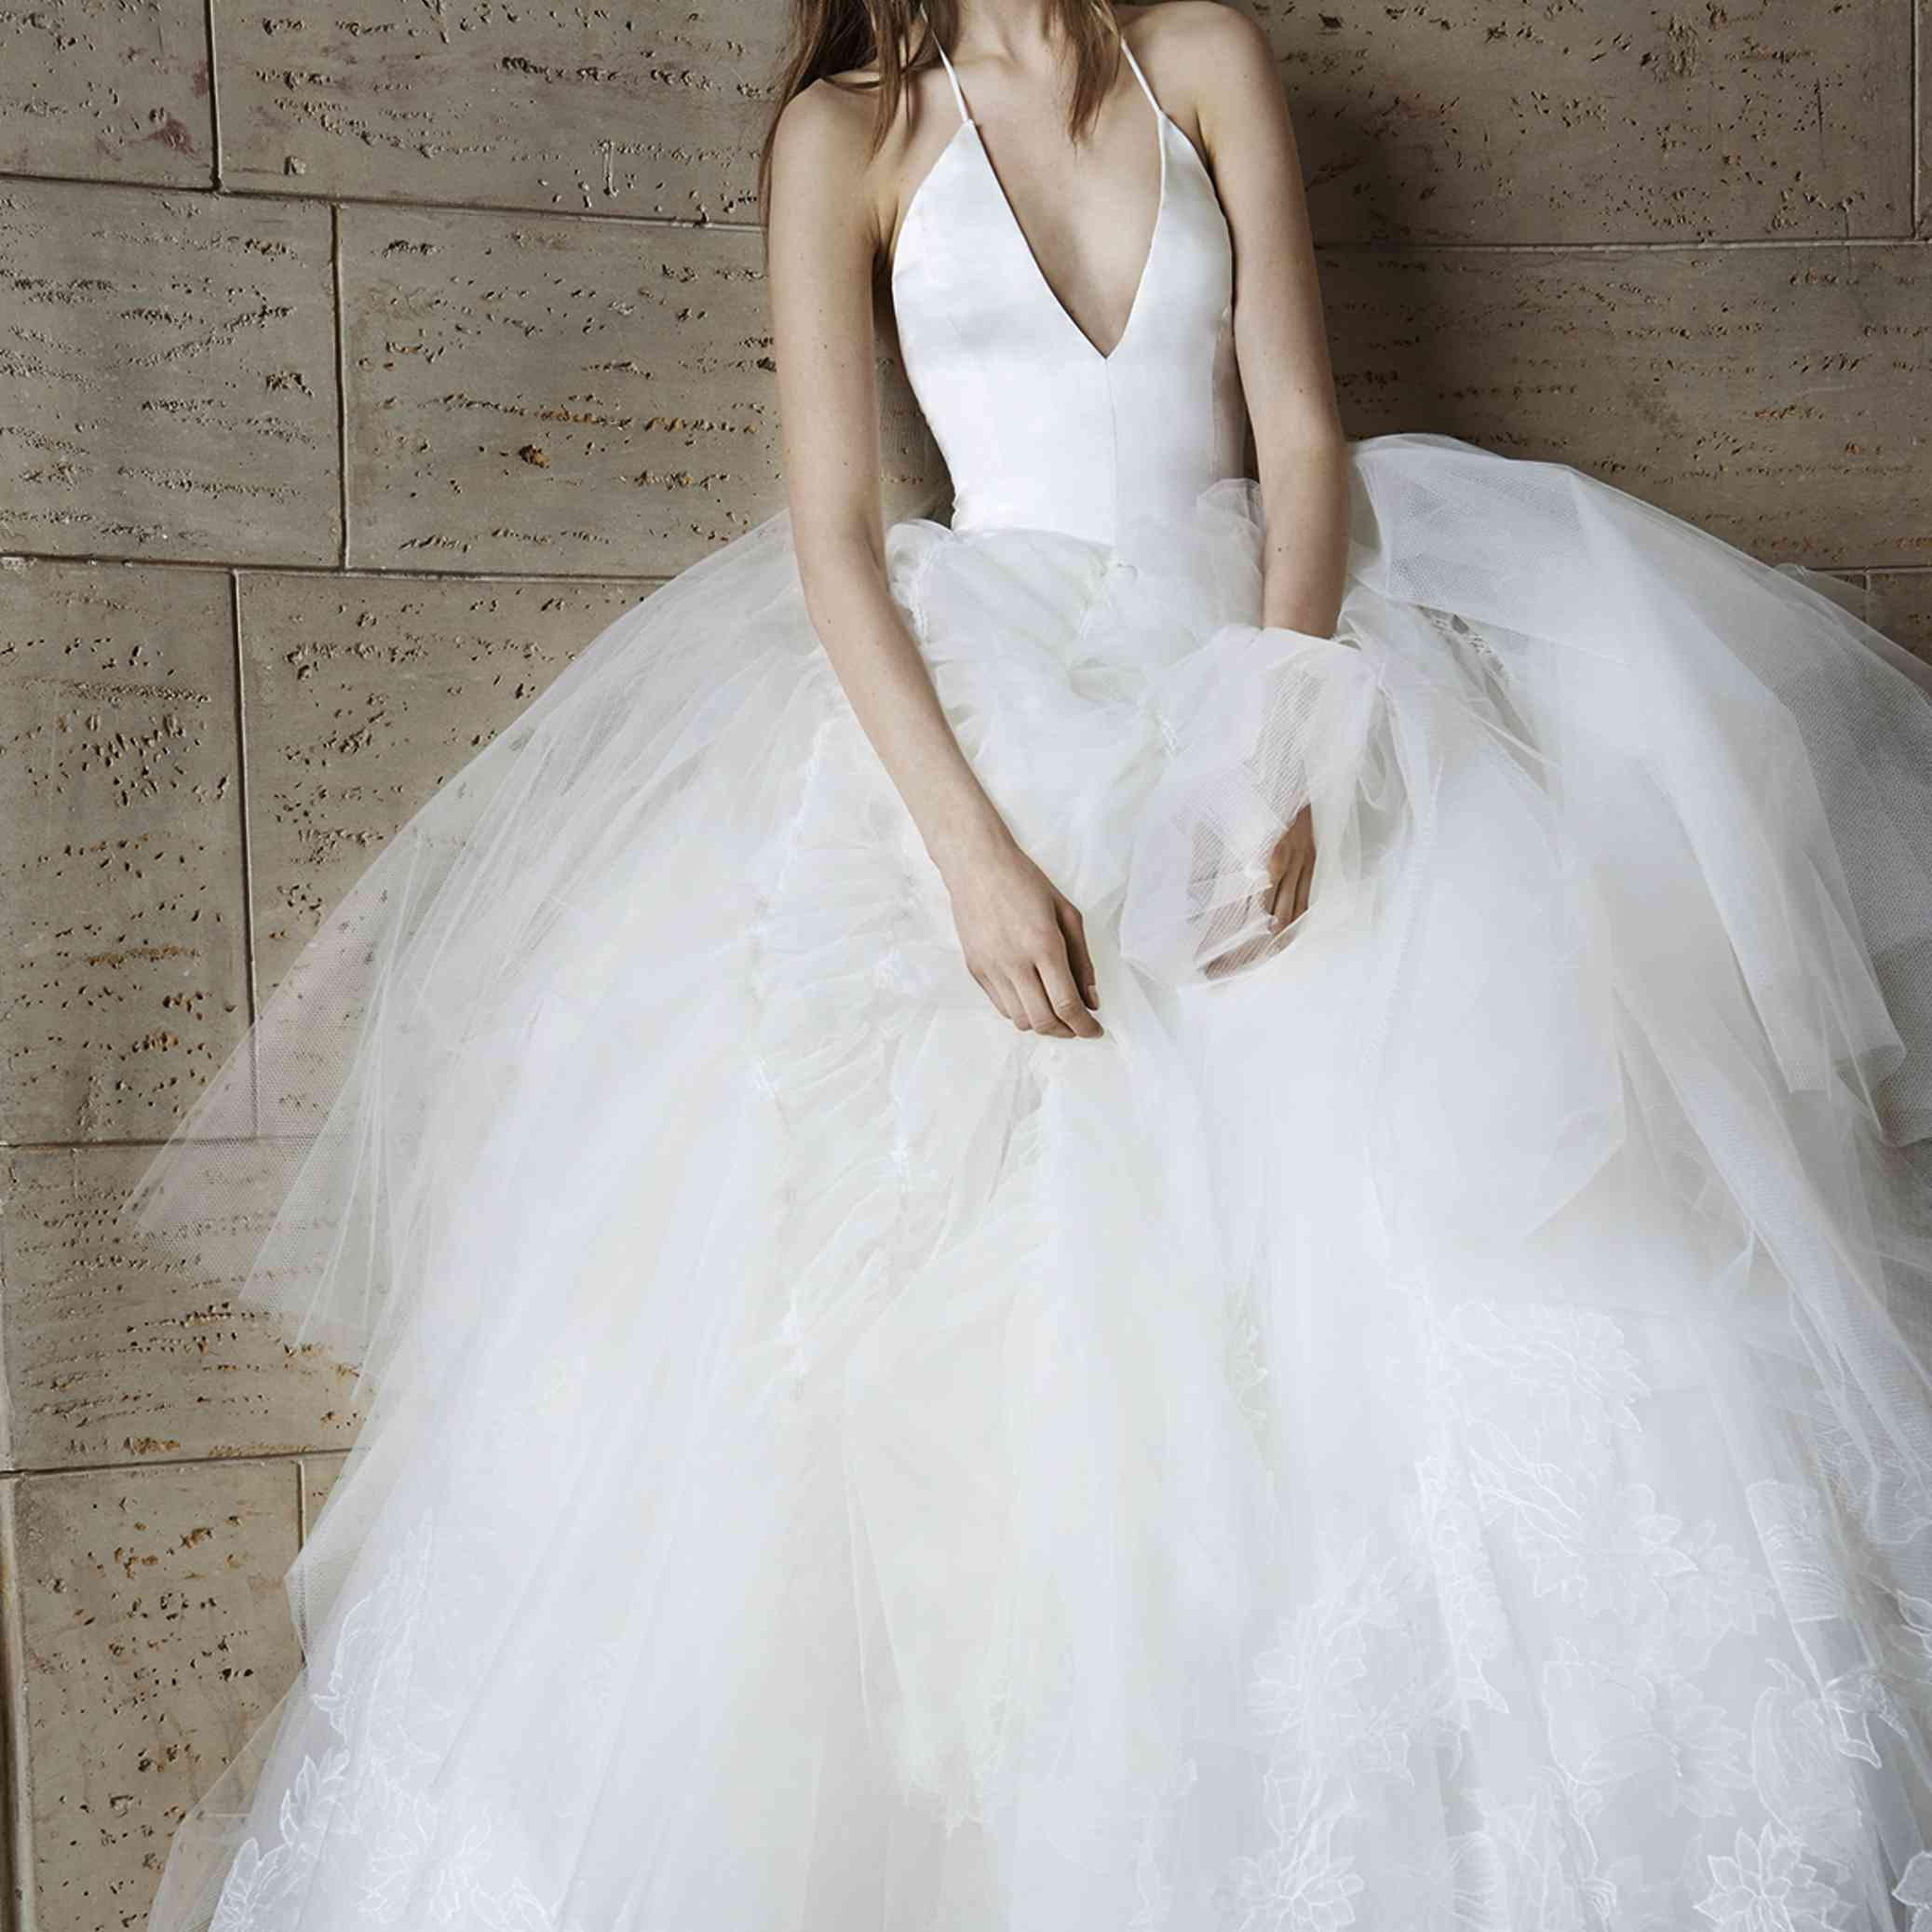 Vera Wang colección novias 2015.